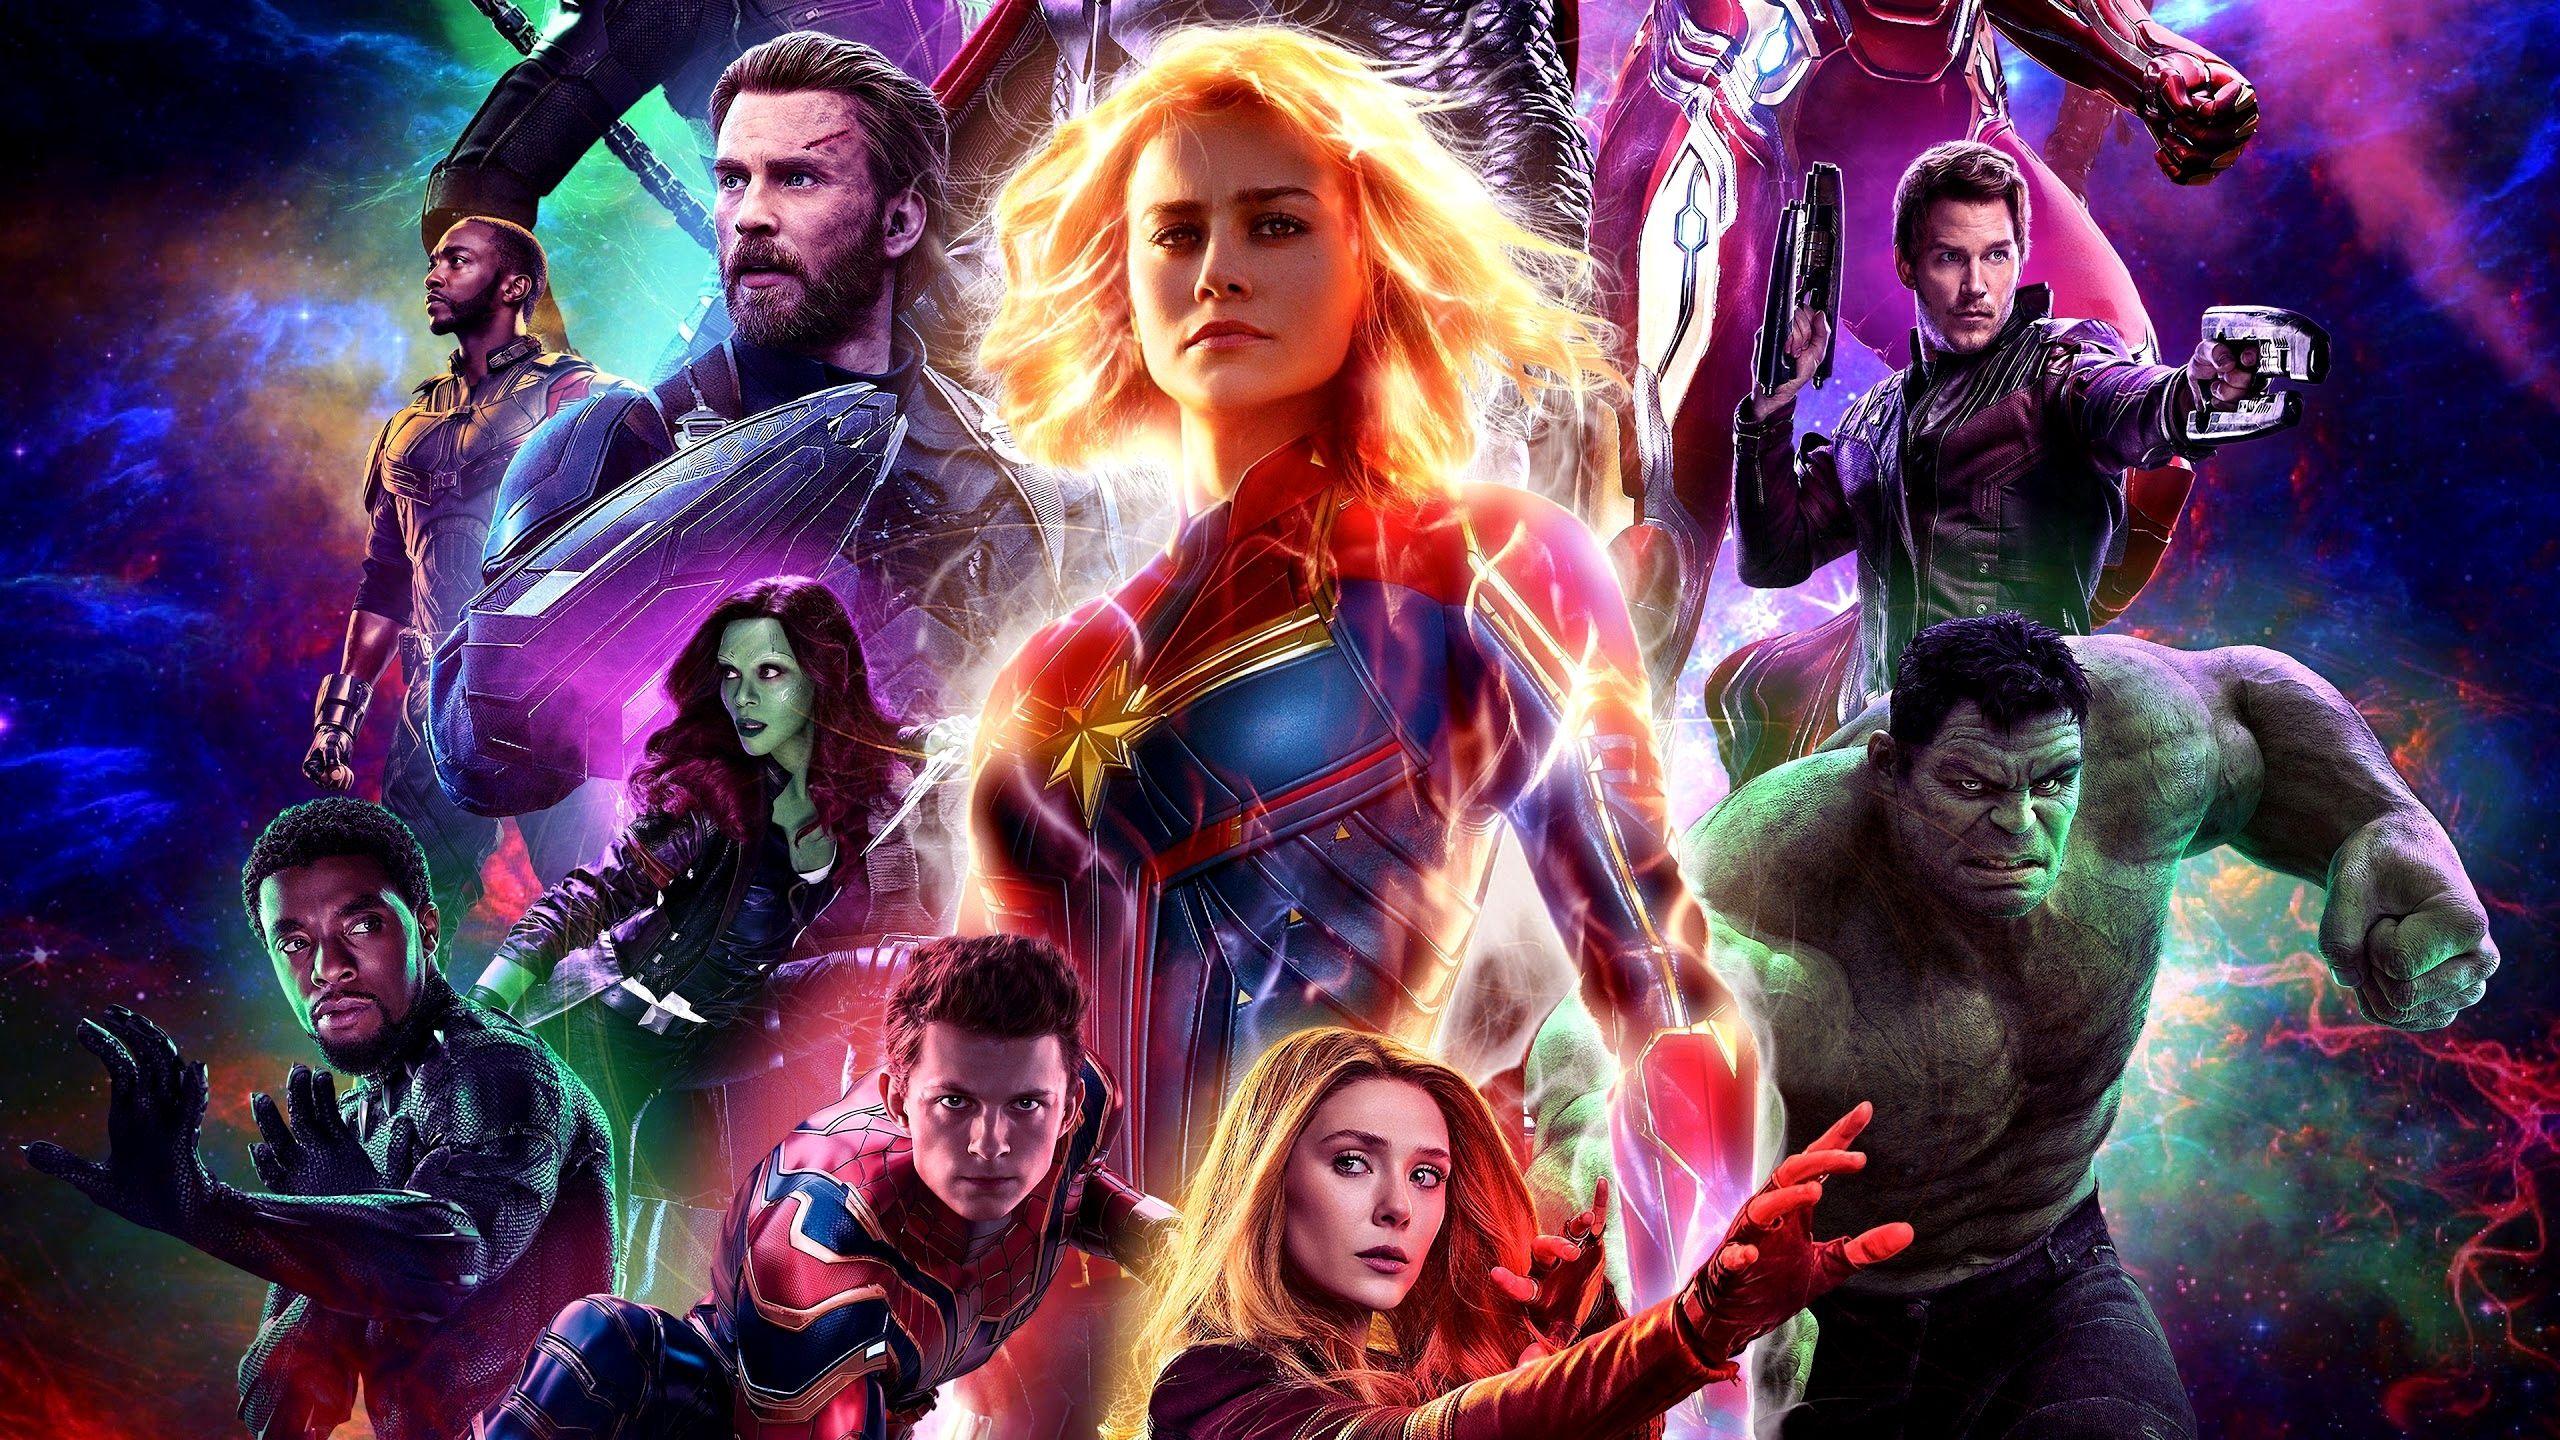 Avengers Wallpaper 4k For Pc Download Trick 4k In 2020 Avengers Cartoon Avengers Wallpaper Captain Marvel